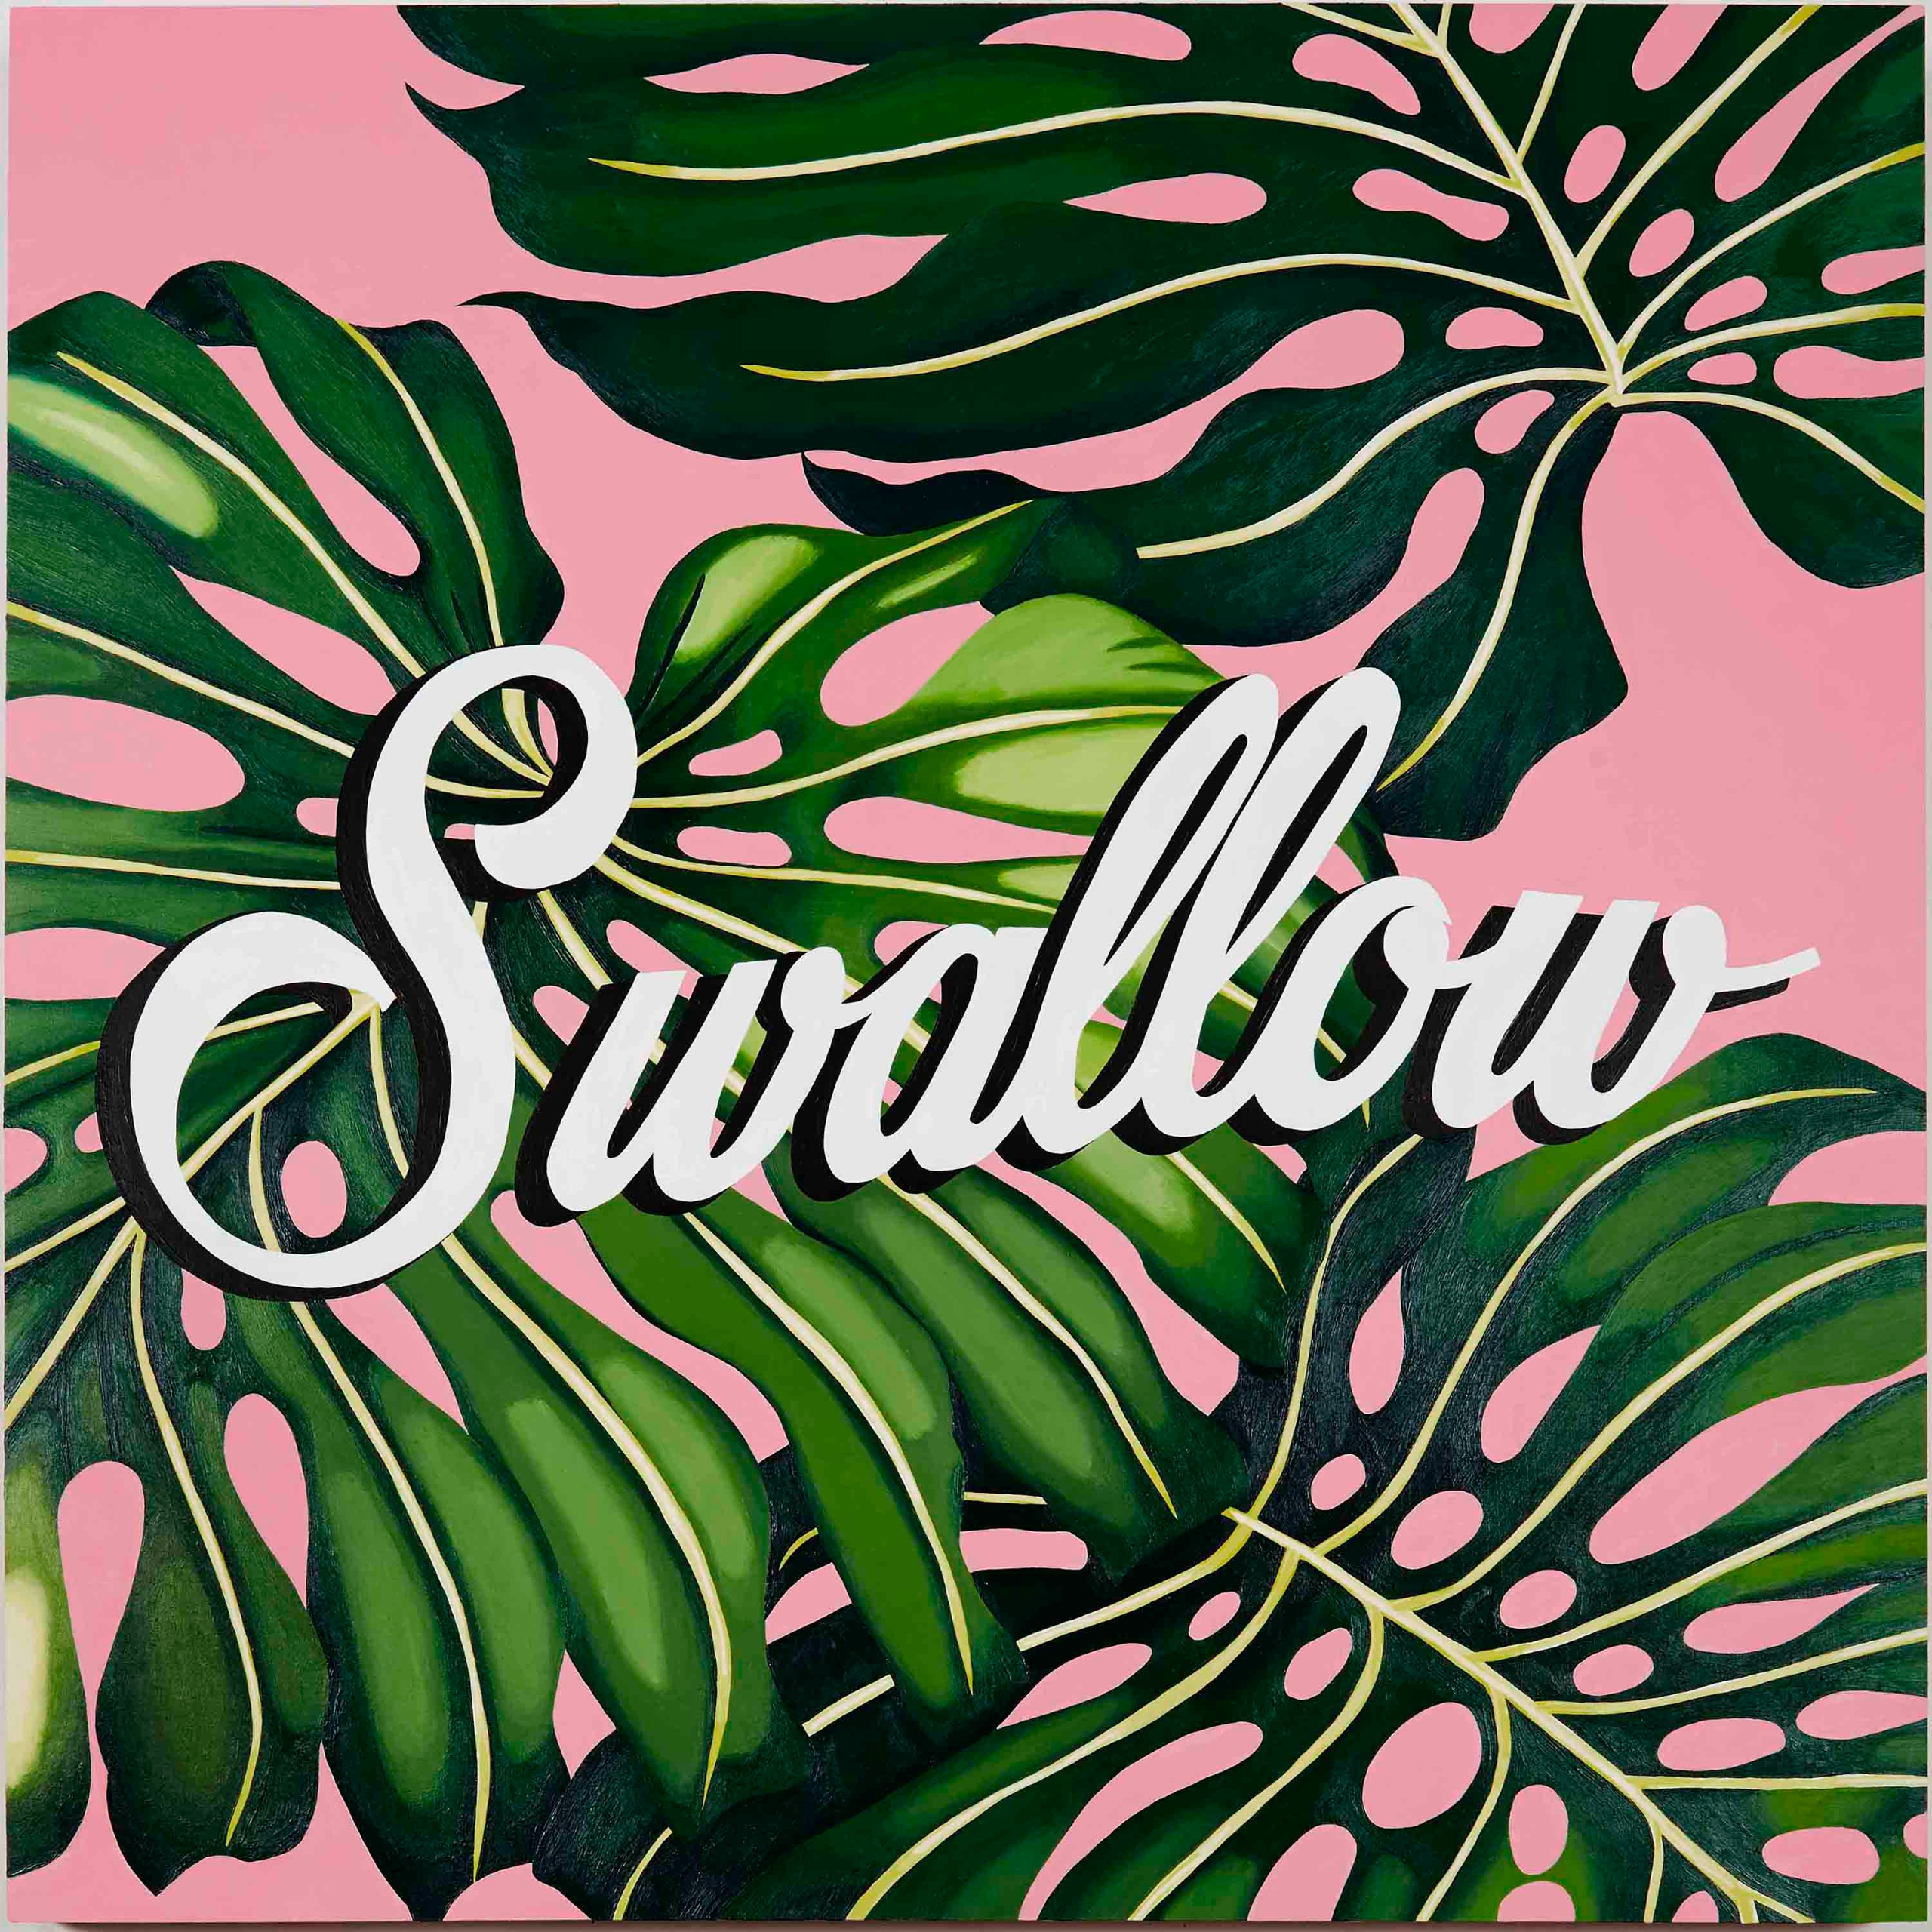 Swallow, 30 30, acrylic wood pa - thecarmenlips | ello